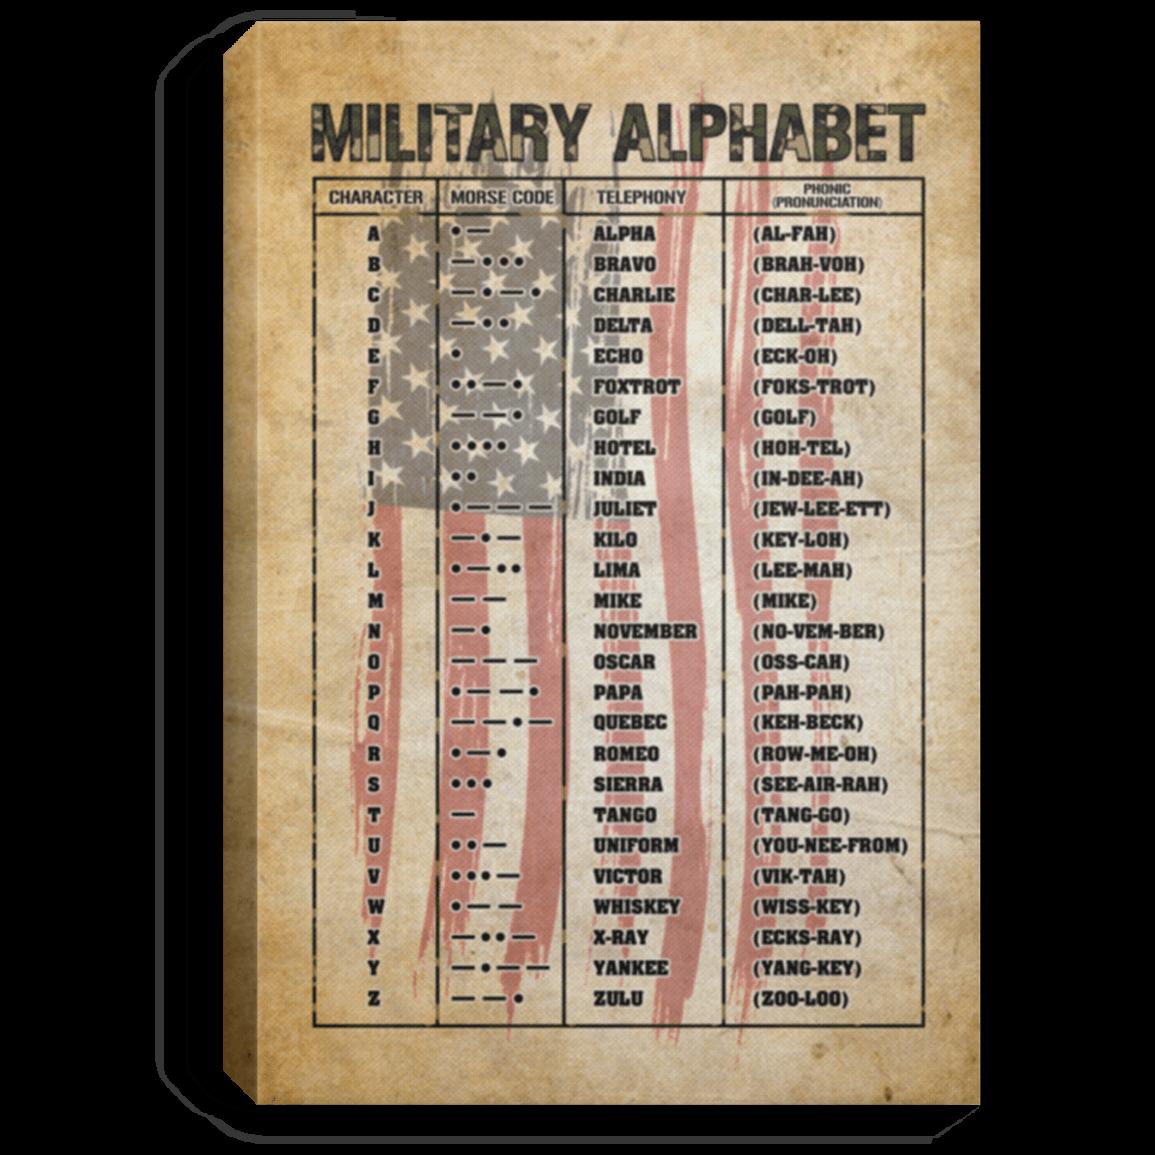 Military Phonetic Alphabet Military Alphabet Morse Gallery Wrapped Framed Canvas Cubebik